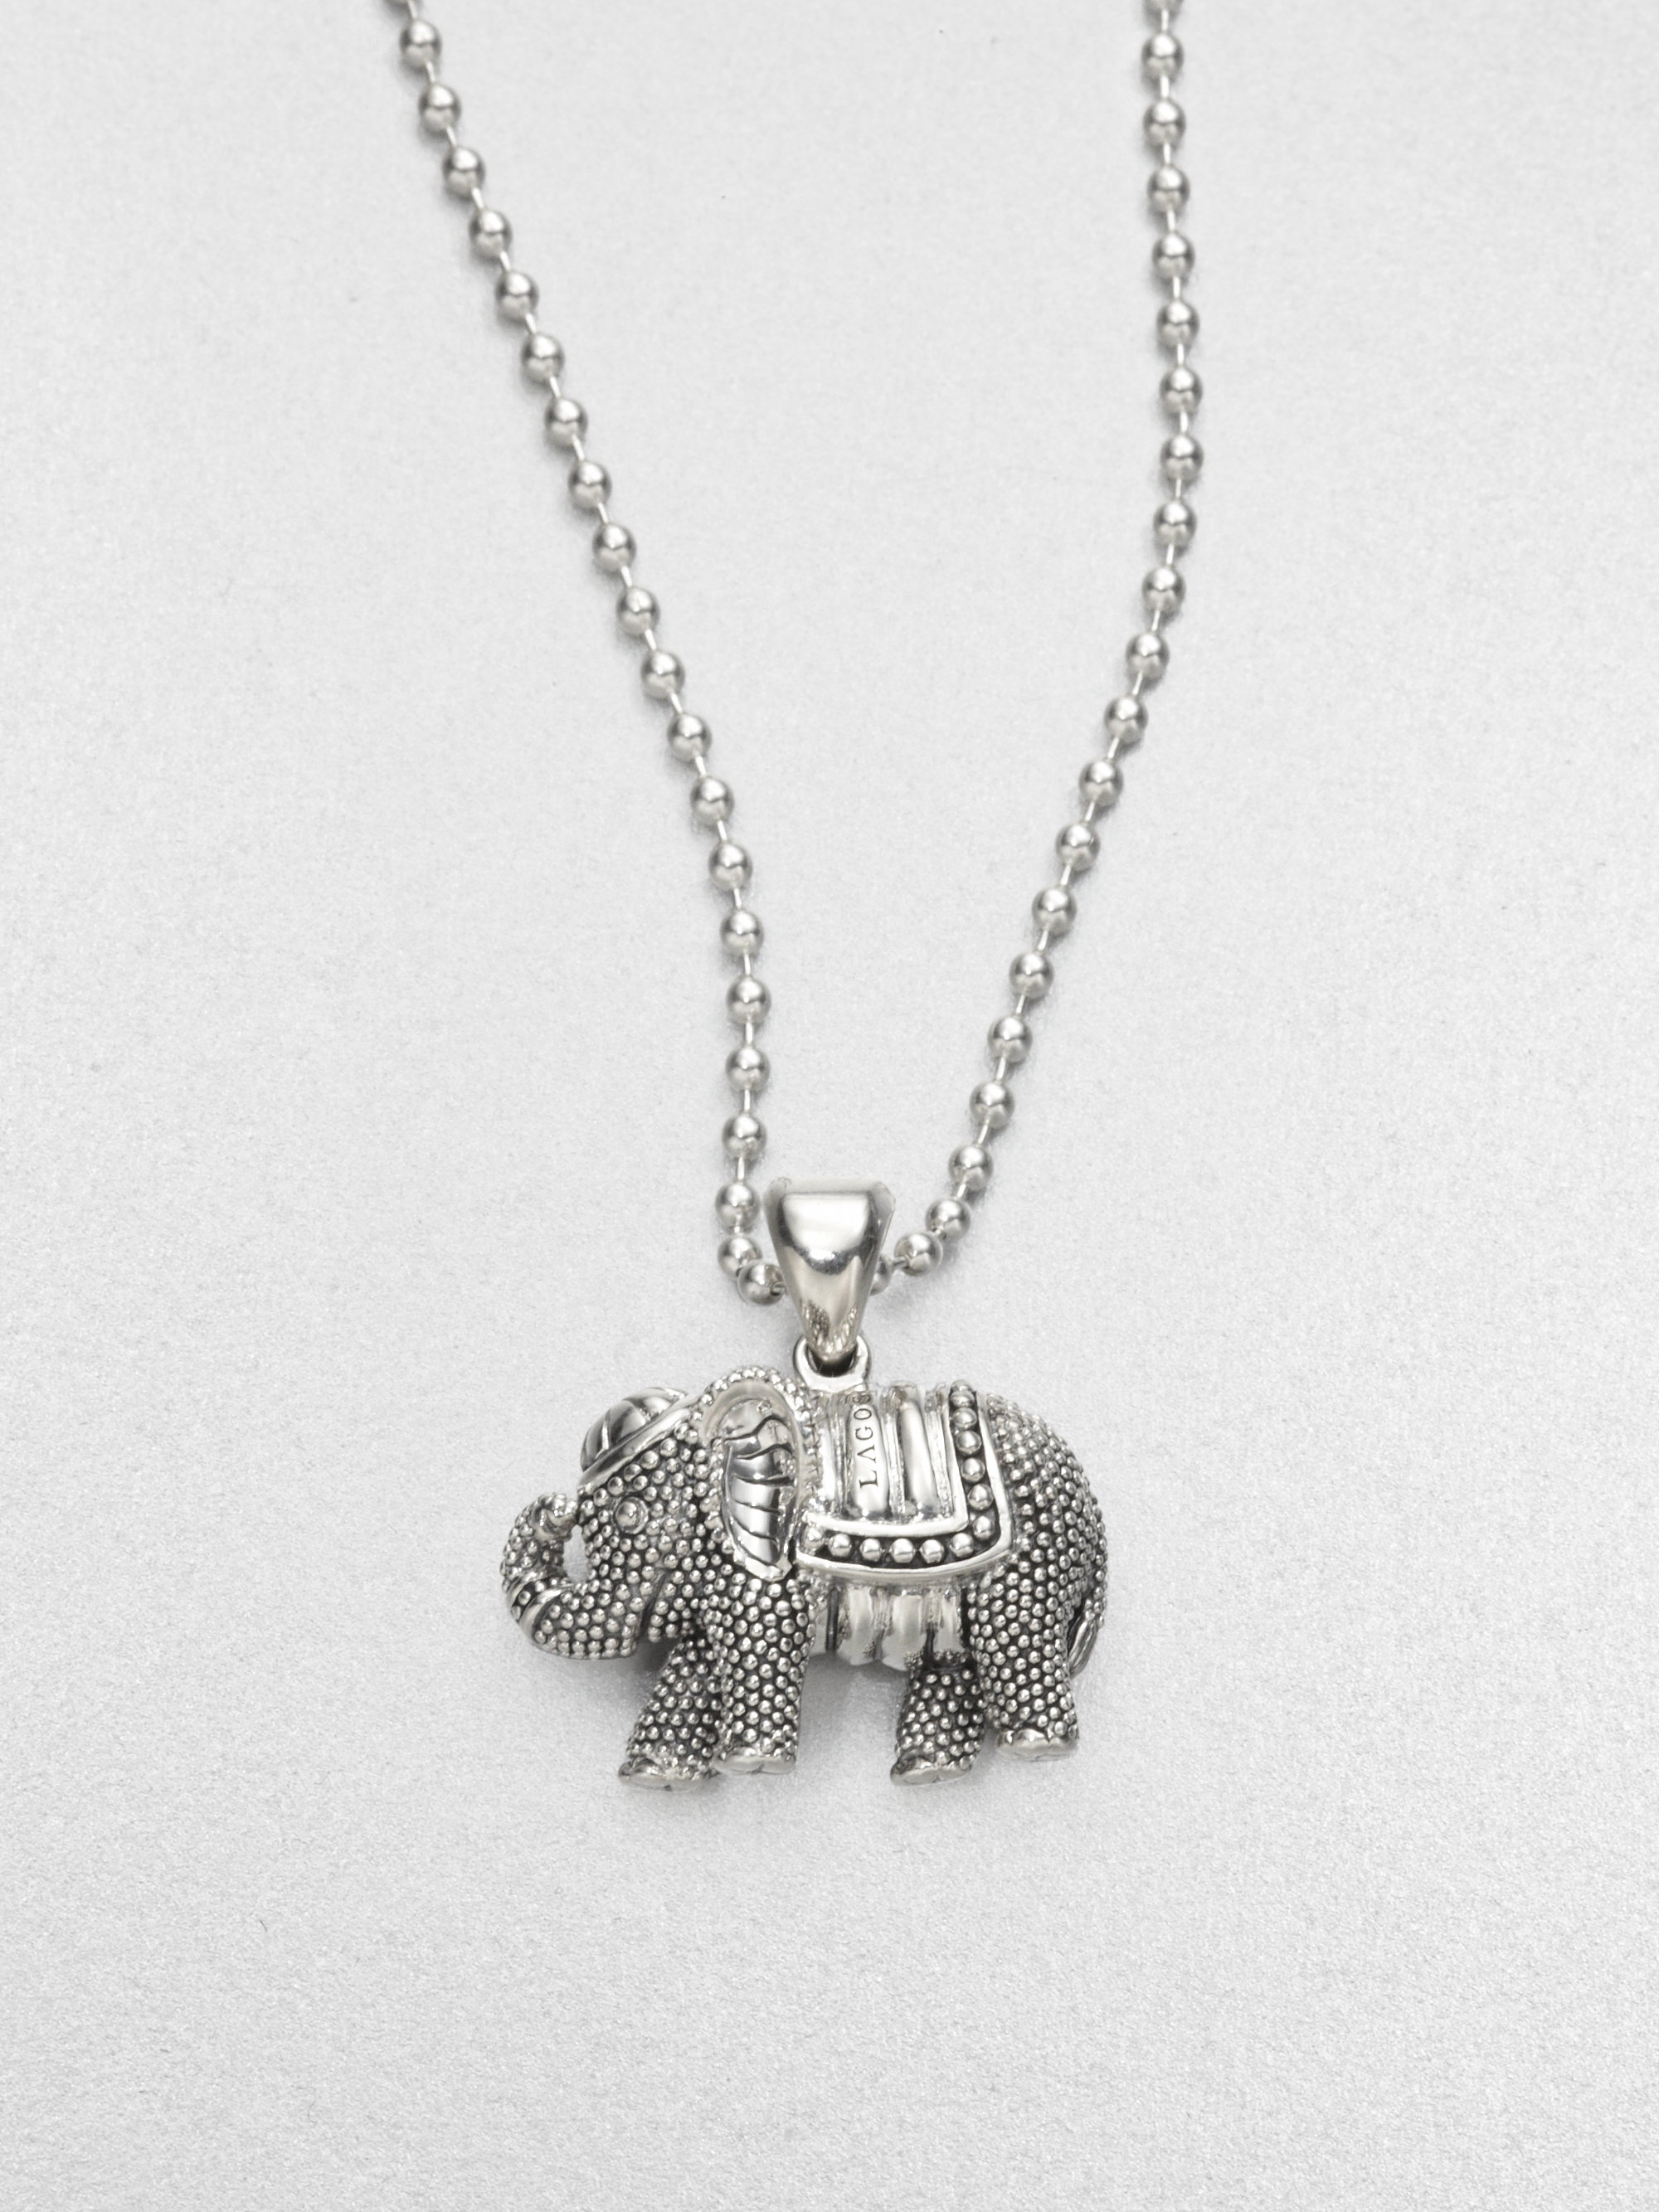 Lyst lagos sterling silver elephant pendant necklace in metallic gallery aloadofball Gallery